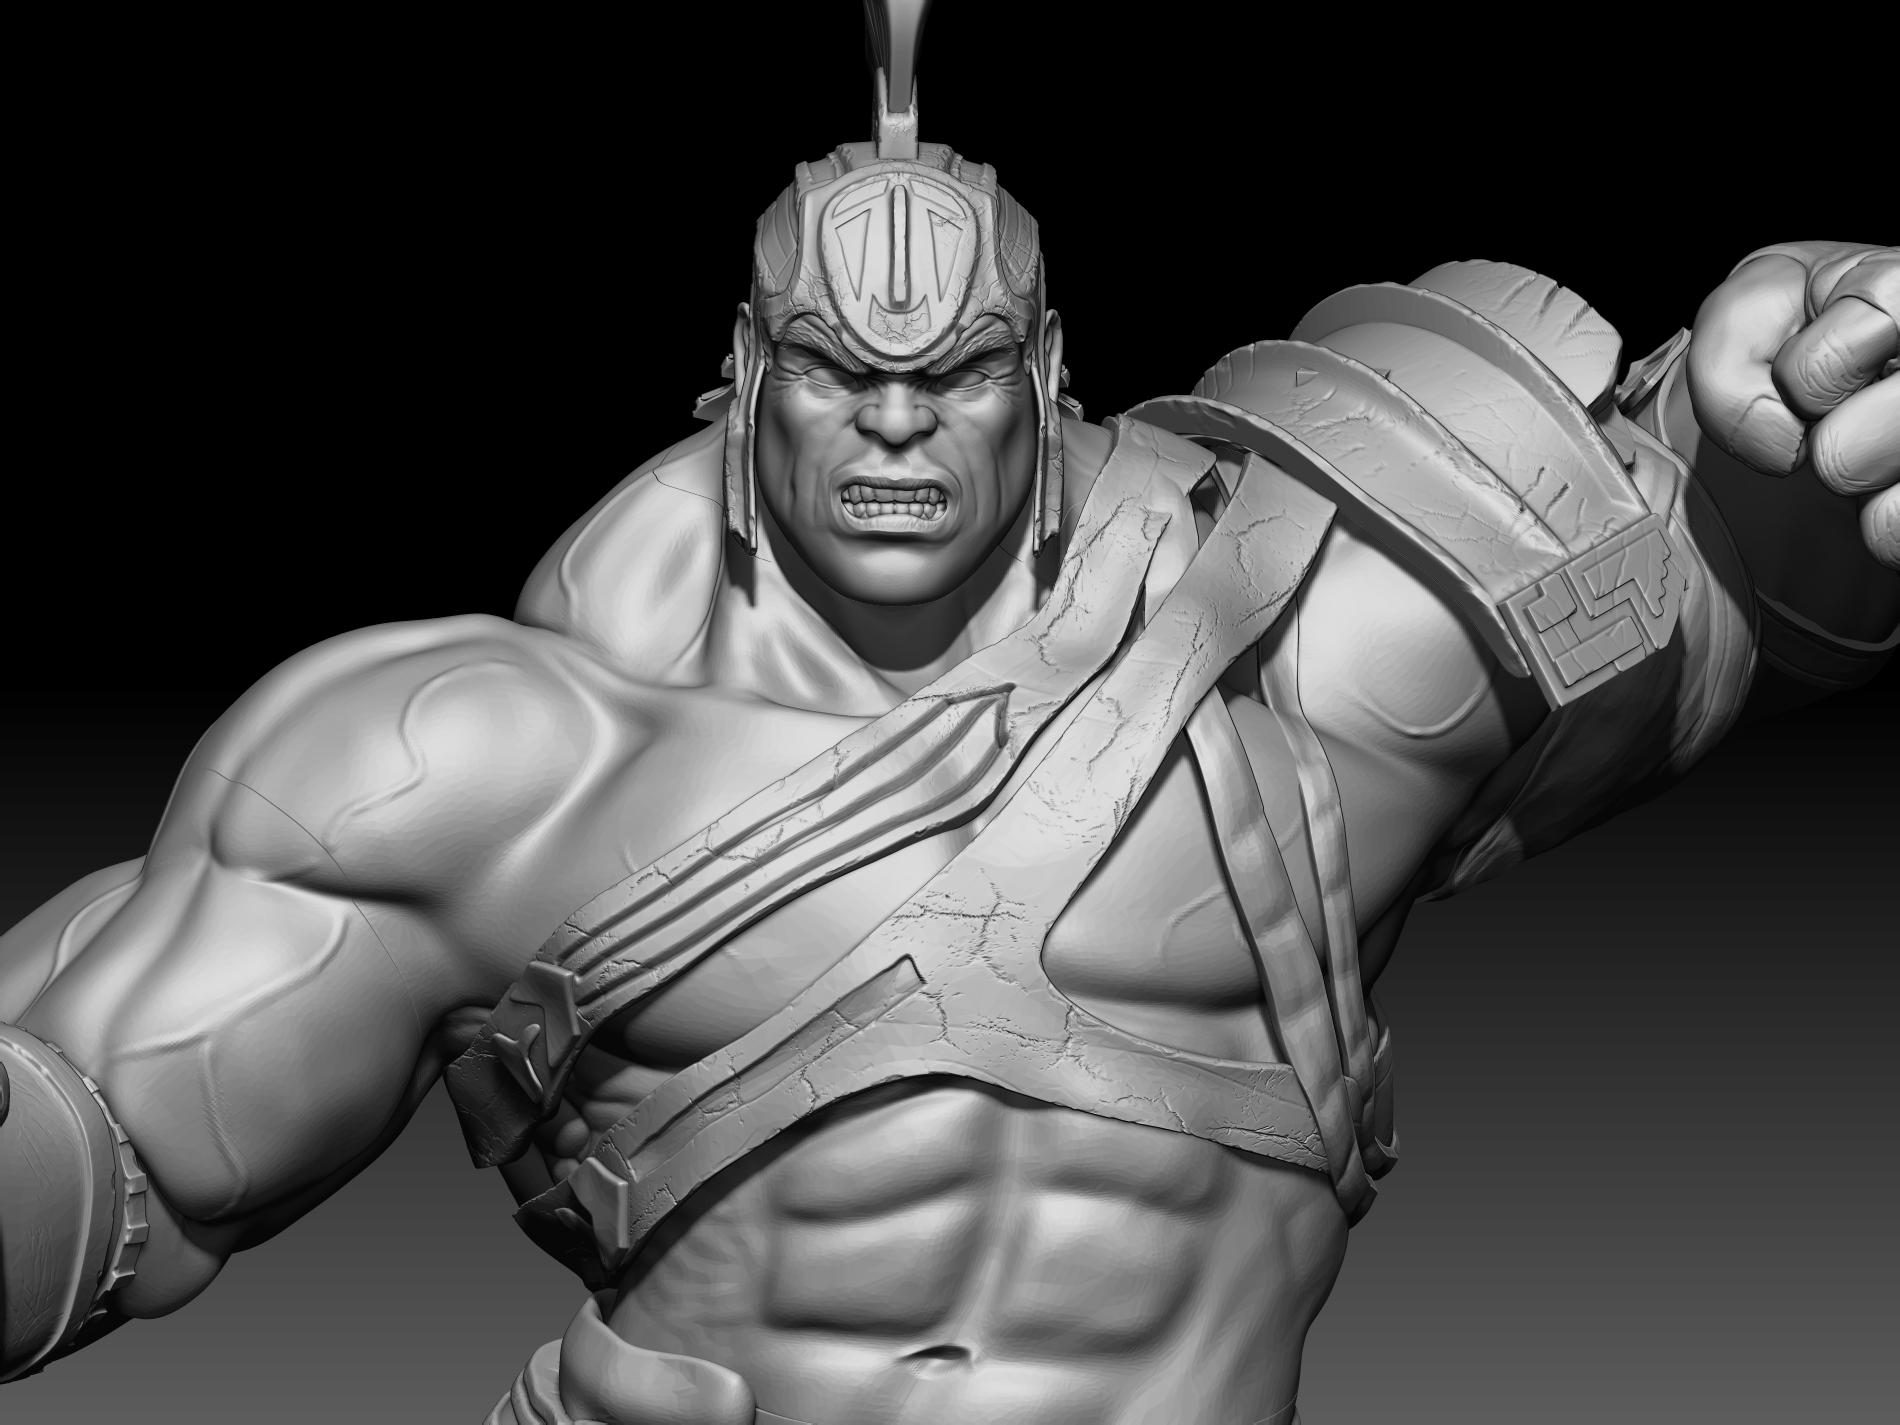 11.jpg Download STL file Hulk 3D print • Model to 3D print, mark_nato